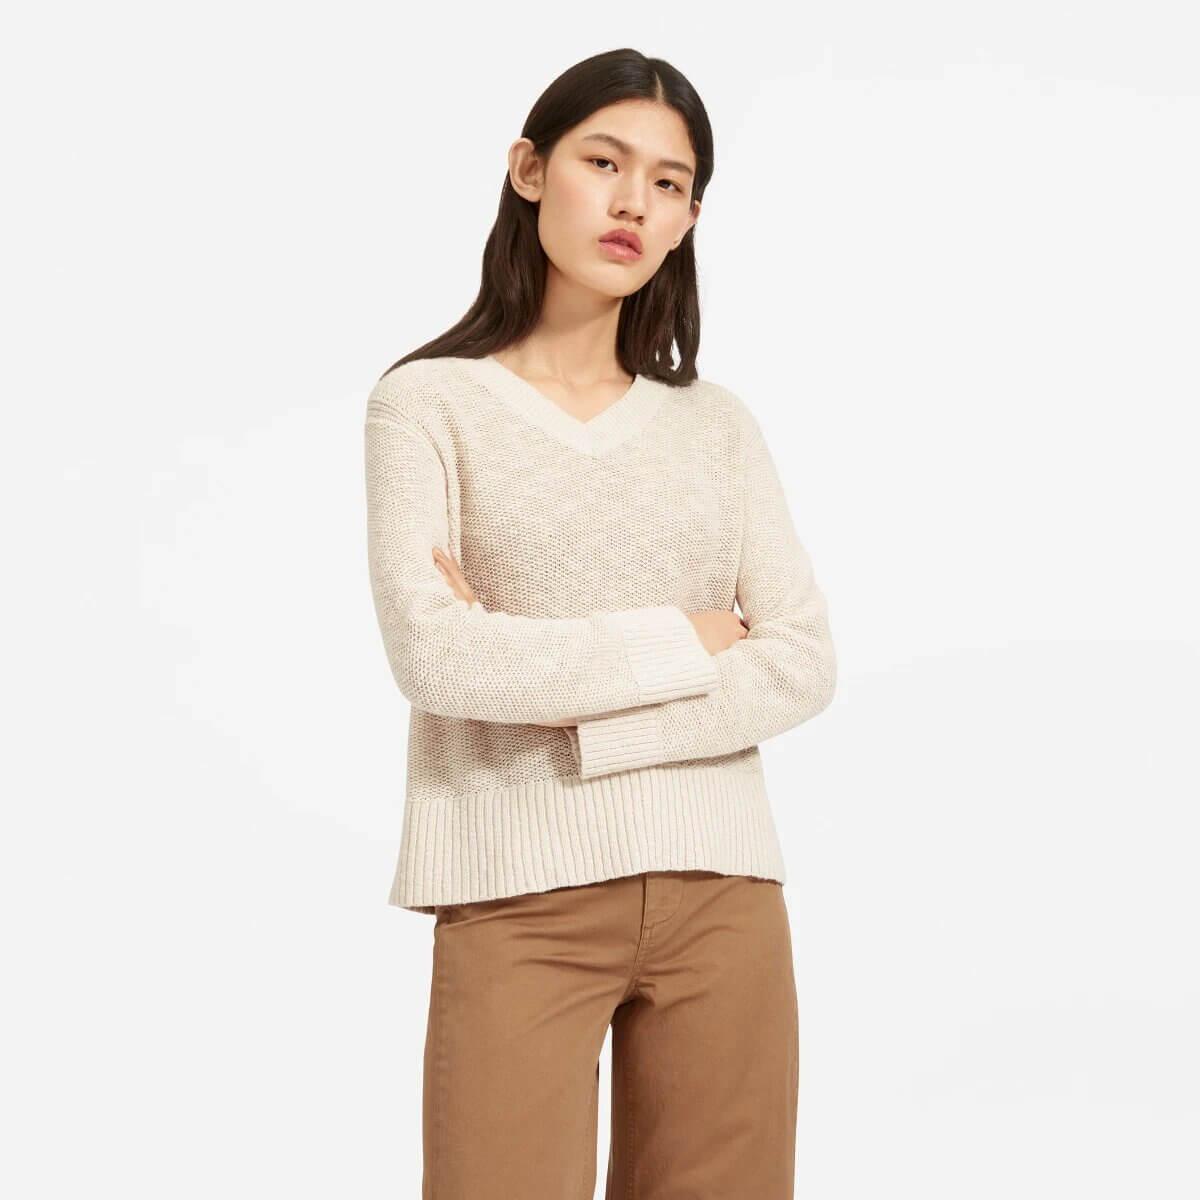 The Cotton-Linen V-Neck